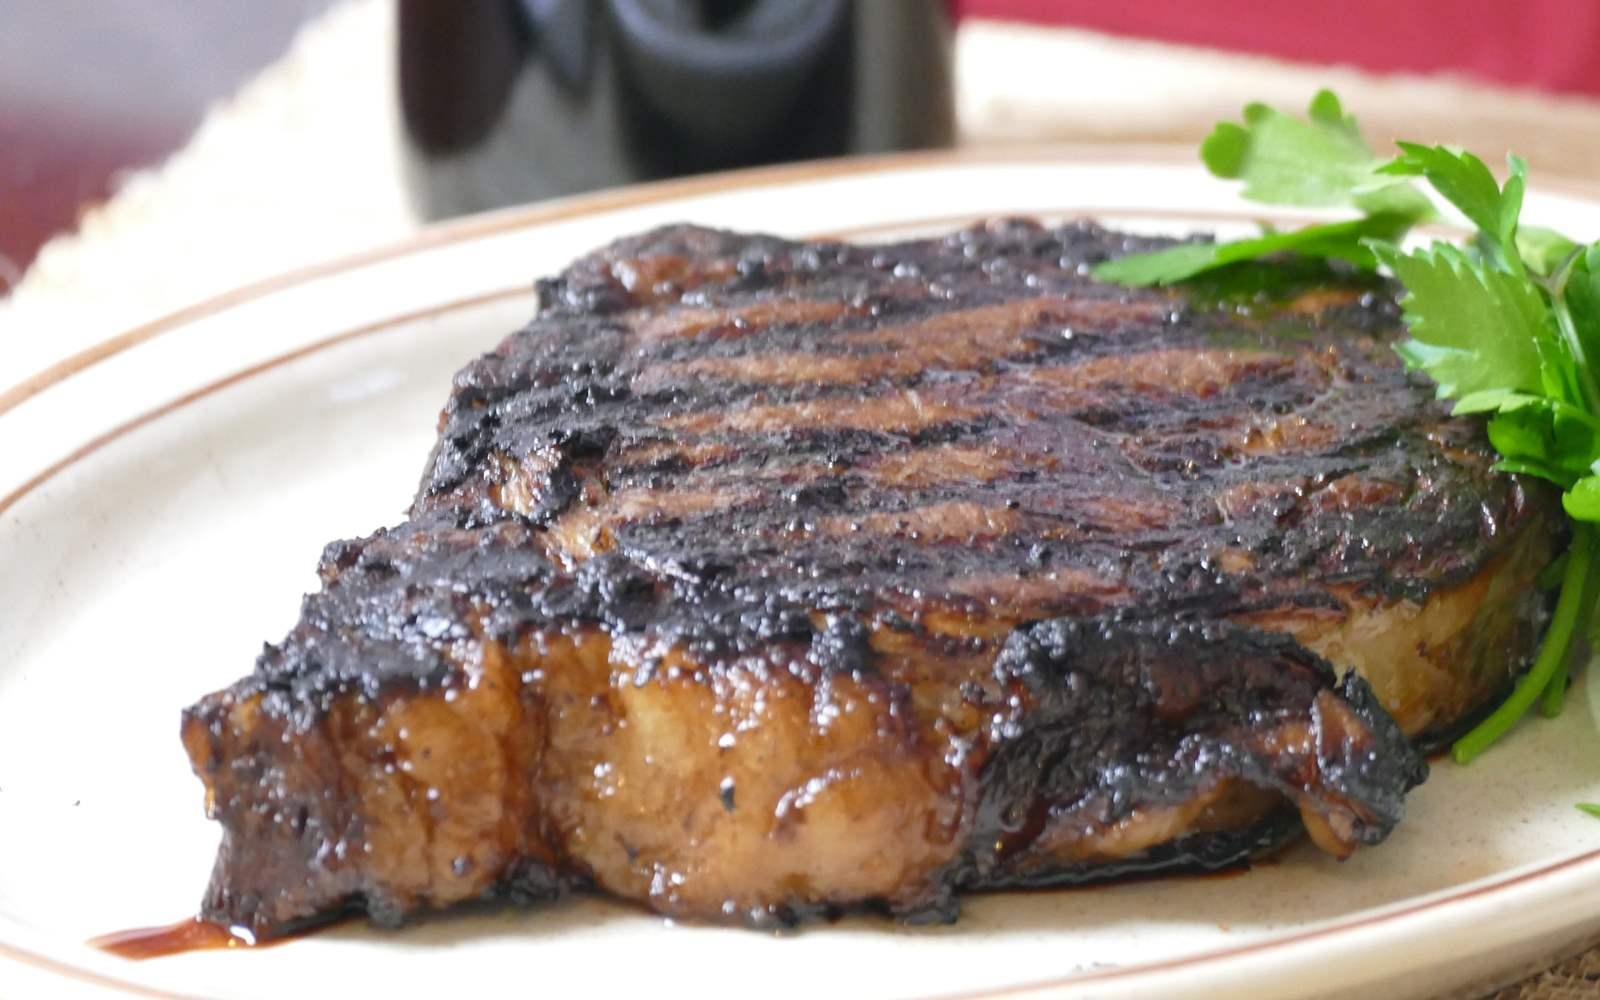 Steaks 'n' Such